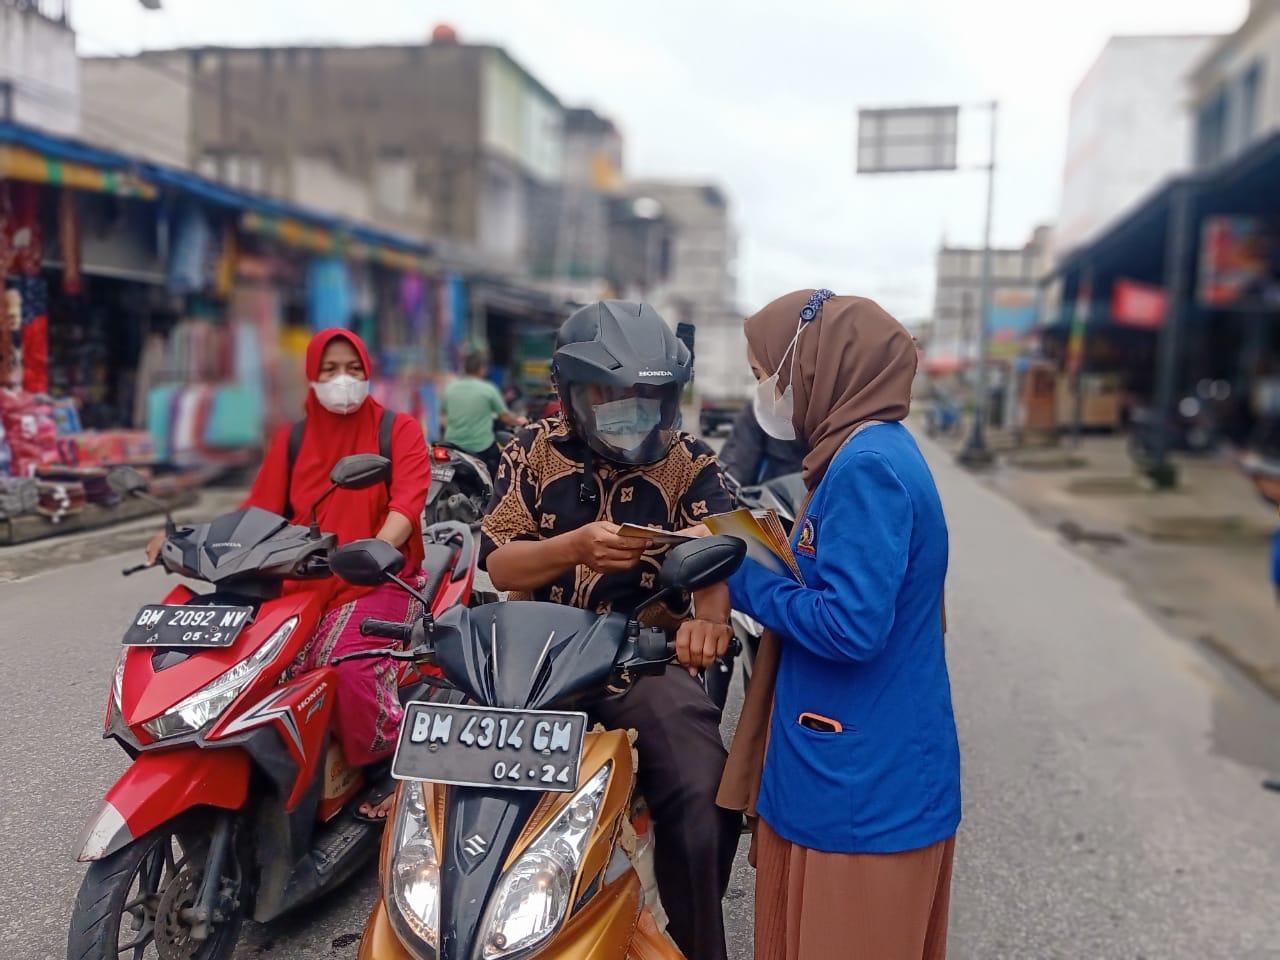 Sambil Promosi, STIKes Husada Gemilang Bagi-bagi Masker